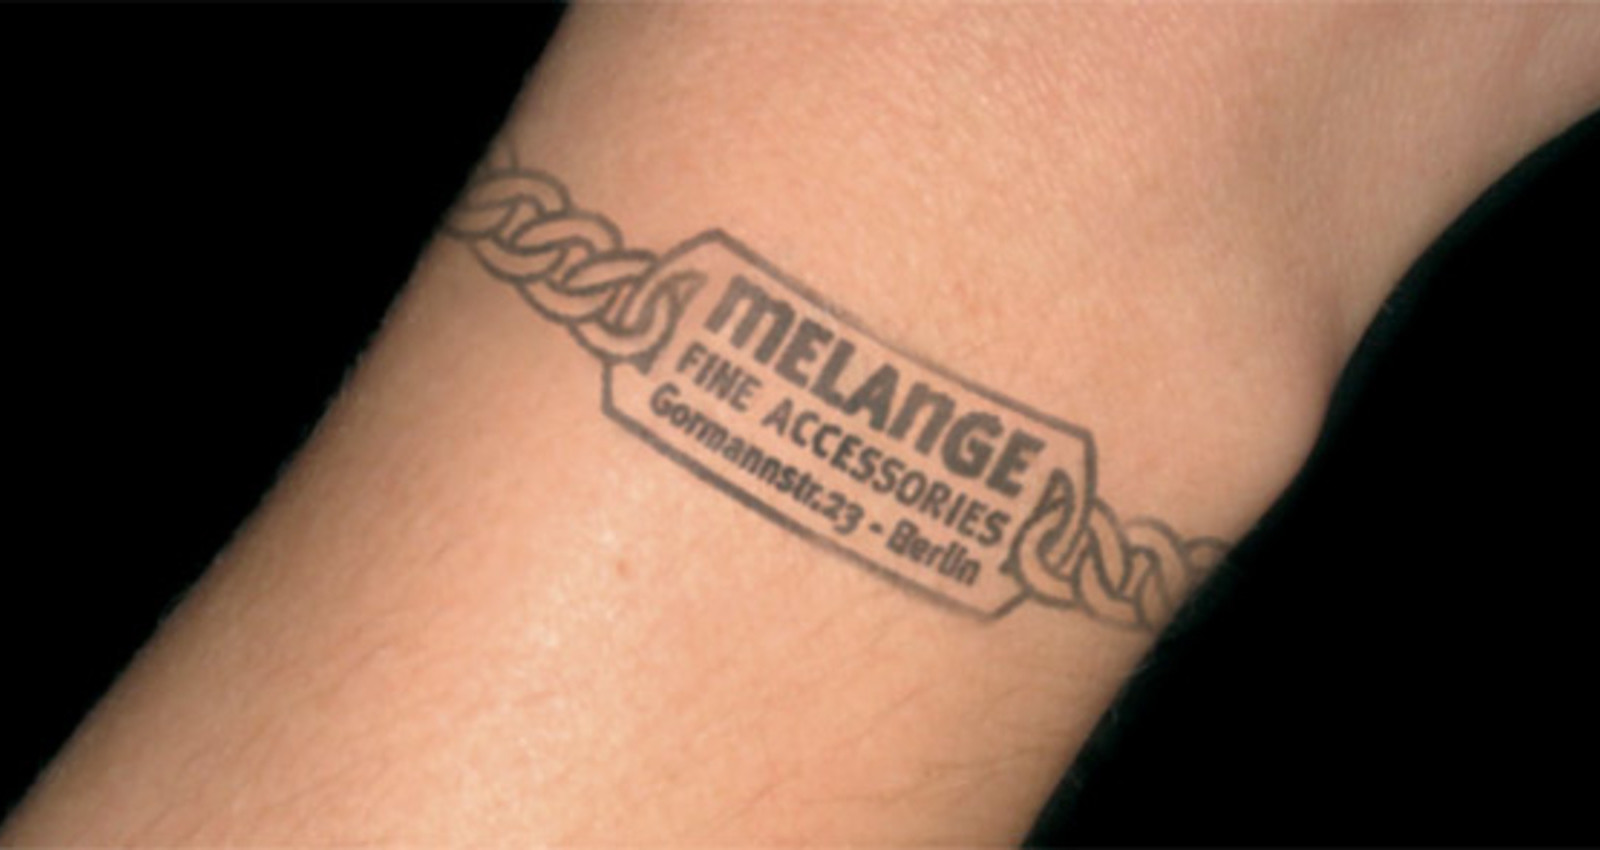 The Melange Accessoires Nightclub Stamp